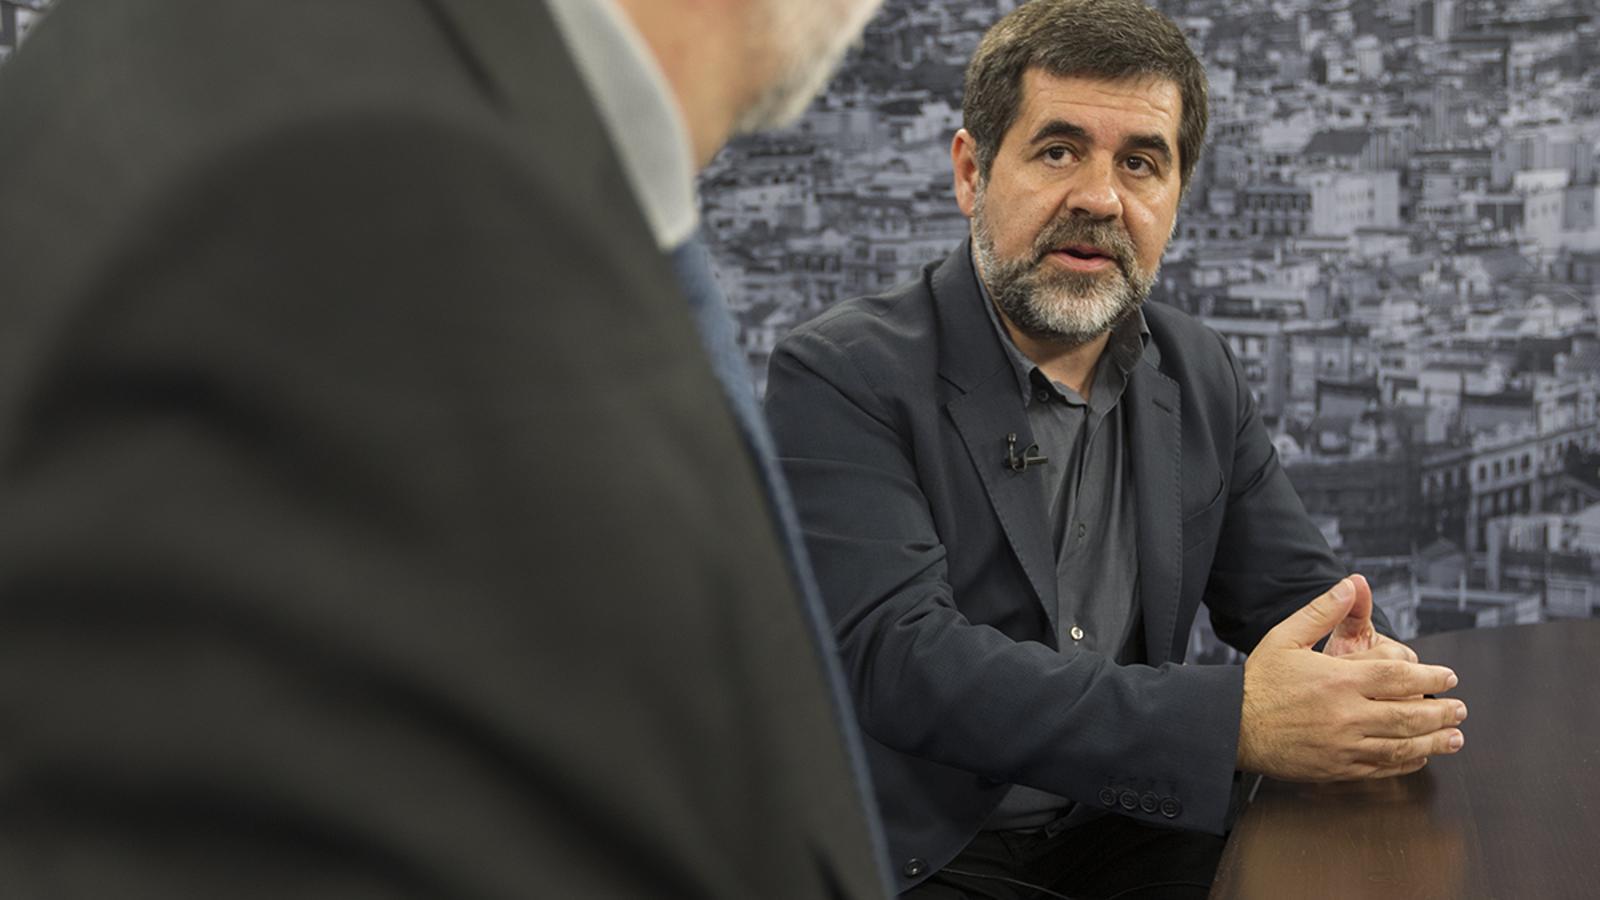 Entrevista d'Antoni Bassas a Jordi Sànchez